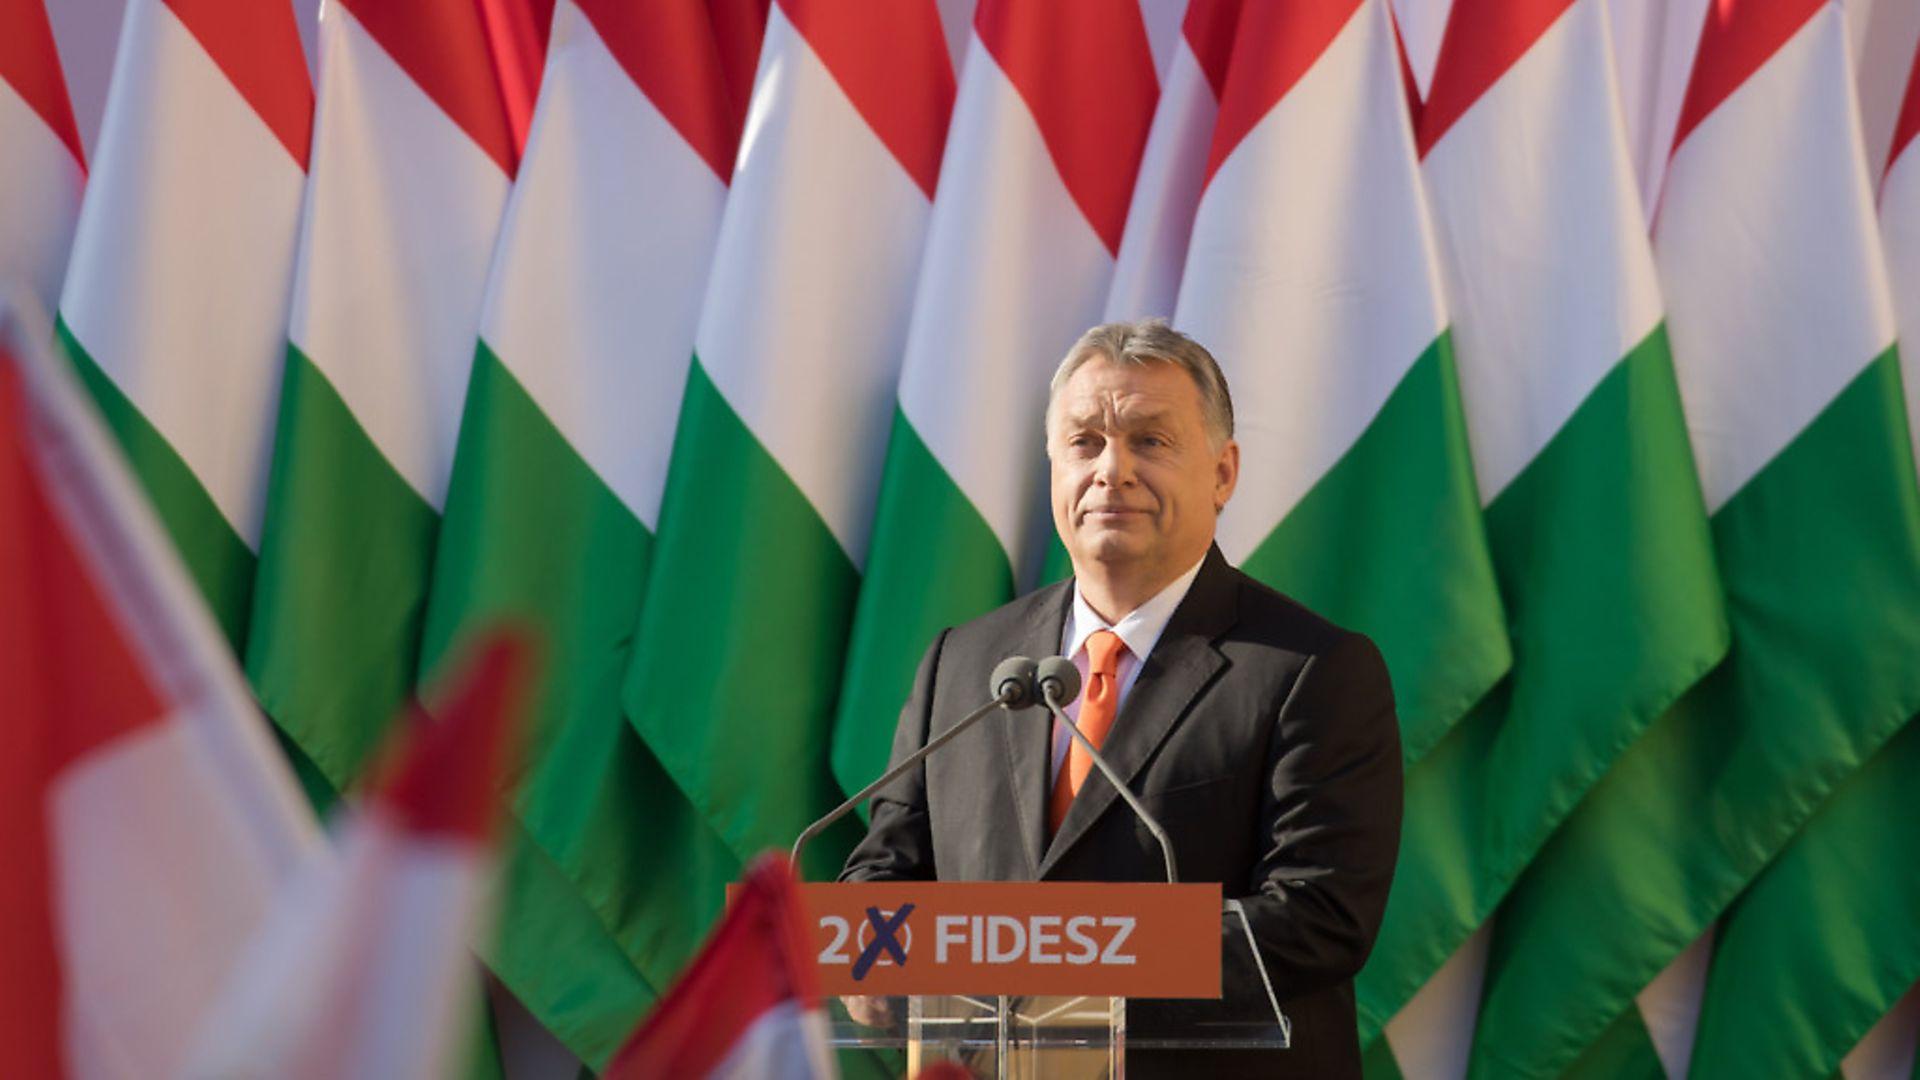 Hungarian prime minister Viktor Orban (question seven) Pic: PA / Xinhua / Attila Volgyi - Credit: Xinhua News Agency/PA Images